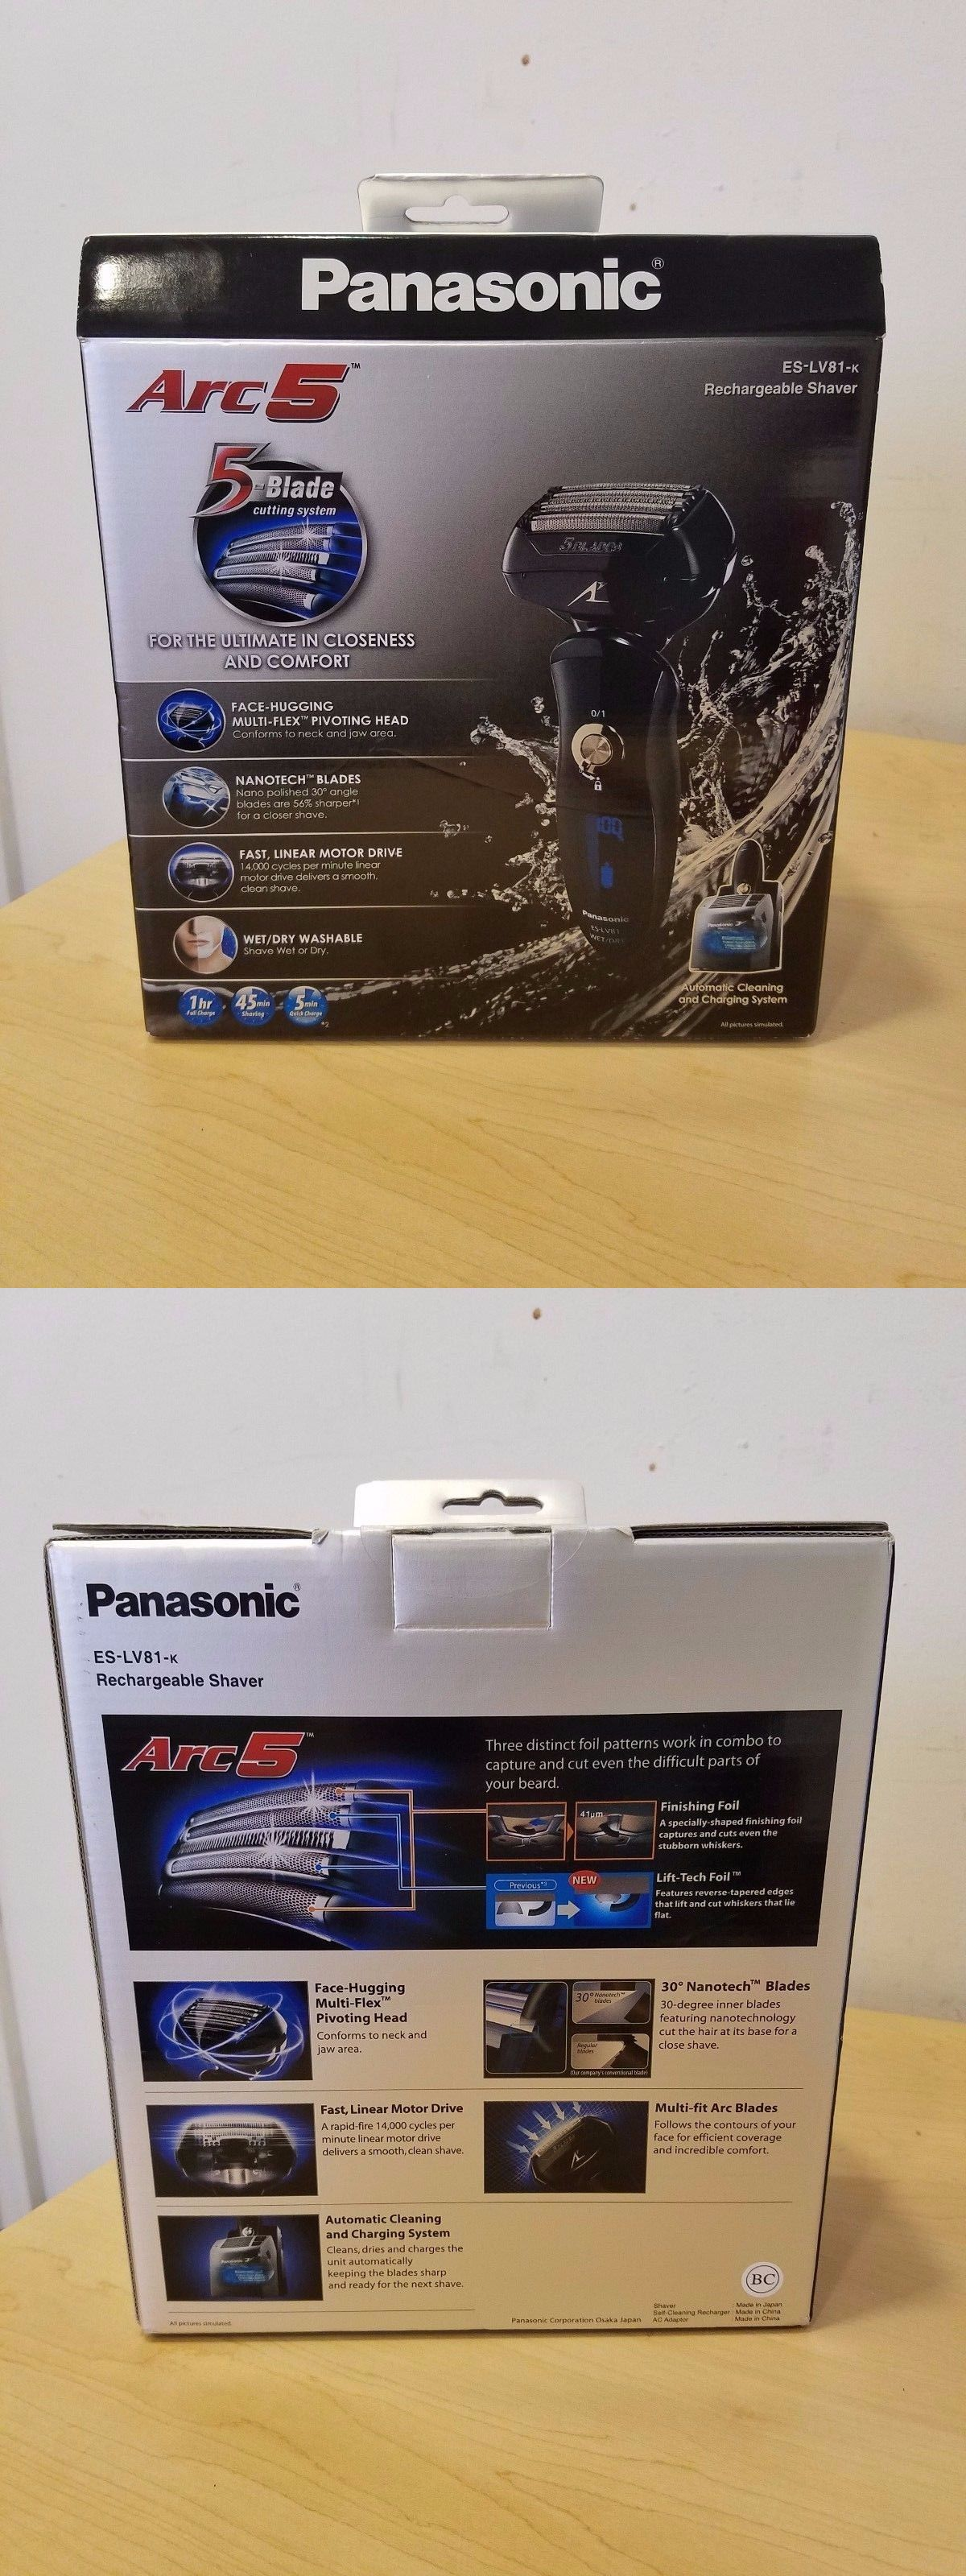 Mens Shavers New Panasonic Es Lv81 K Arc5 Cordless Rechargeable Men Rw30 Electric Shaver With Flexible Pivoting Head W